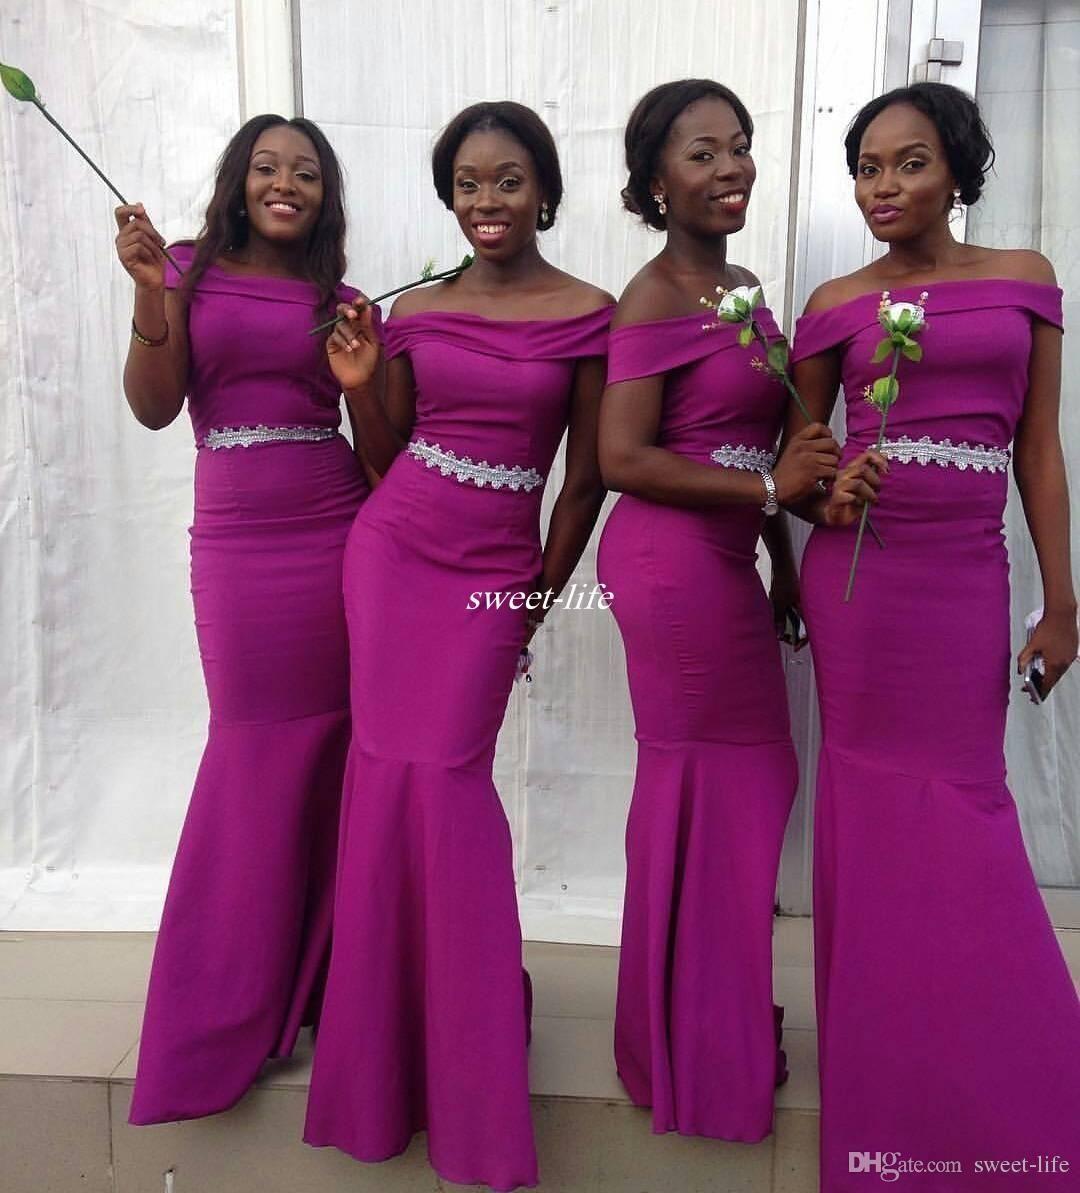 Elegant purple sheath long bridesmaid dresses off shoulder lace elegant purple sheath long bridesmaid dresses off shoulder lace satin cap sleeve ombrellifo Image collections